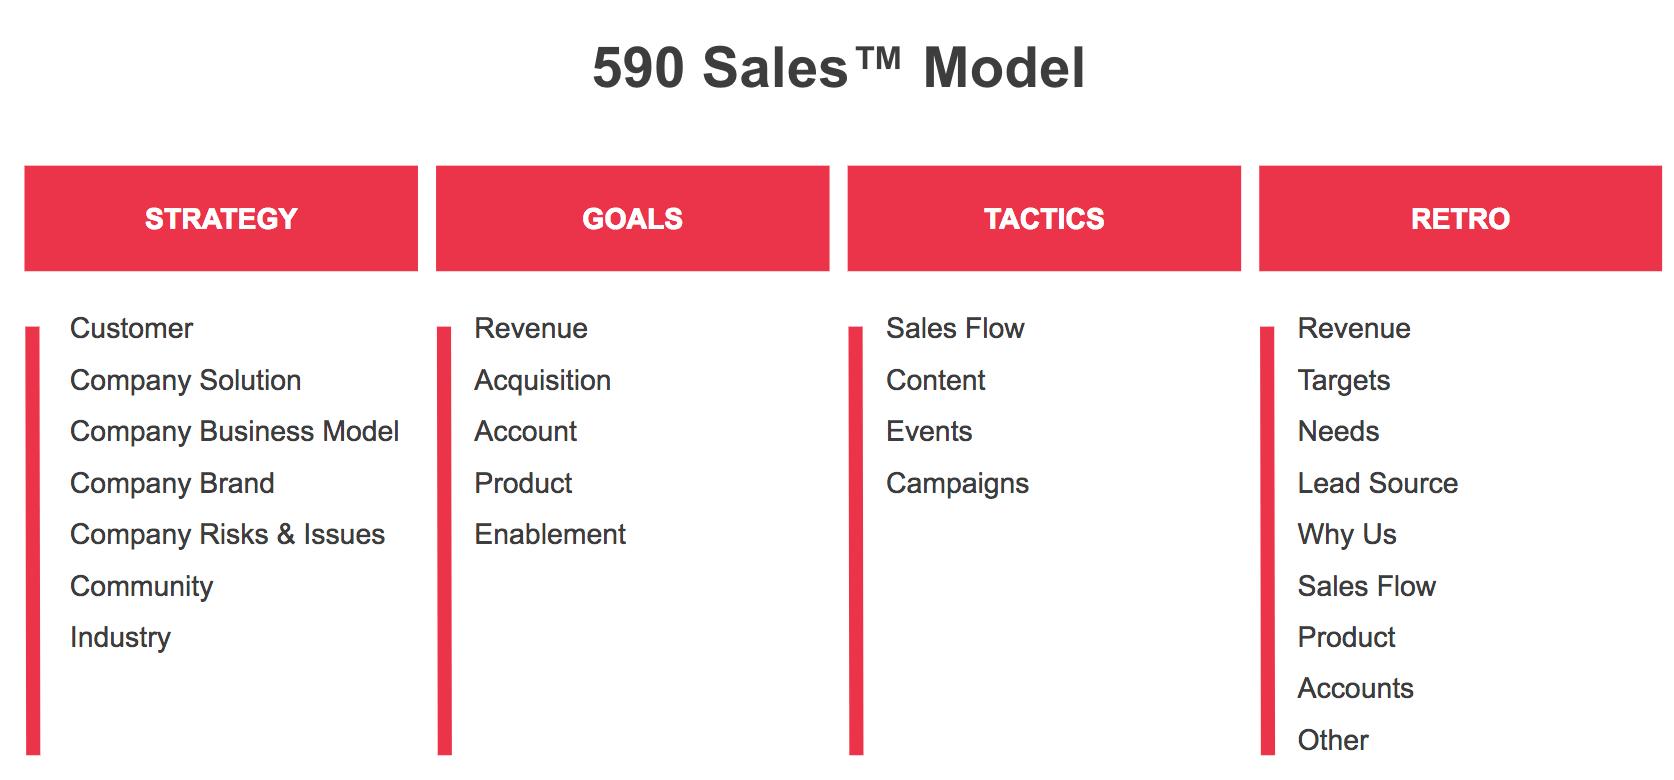 590 Sales Model